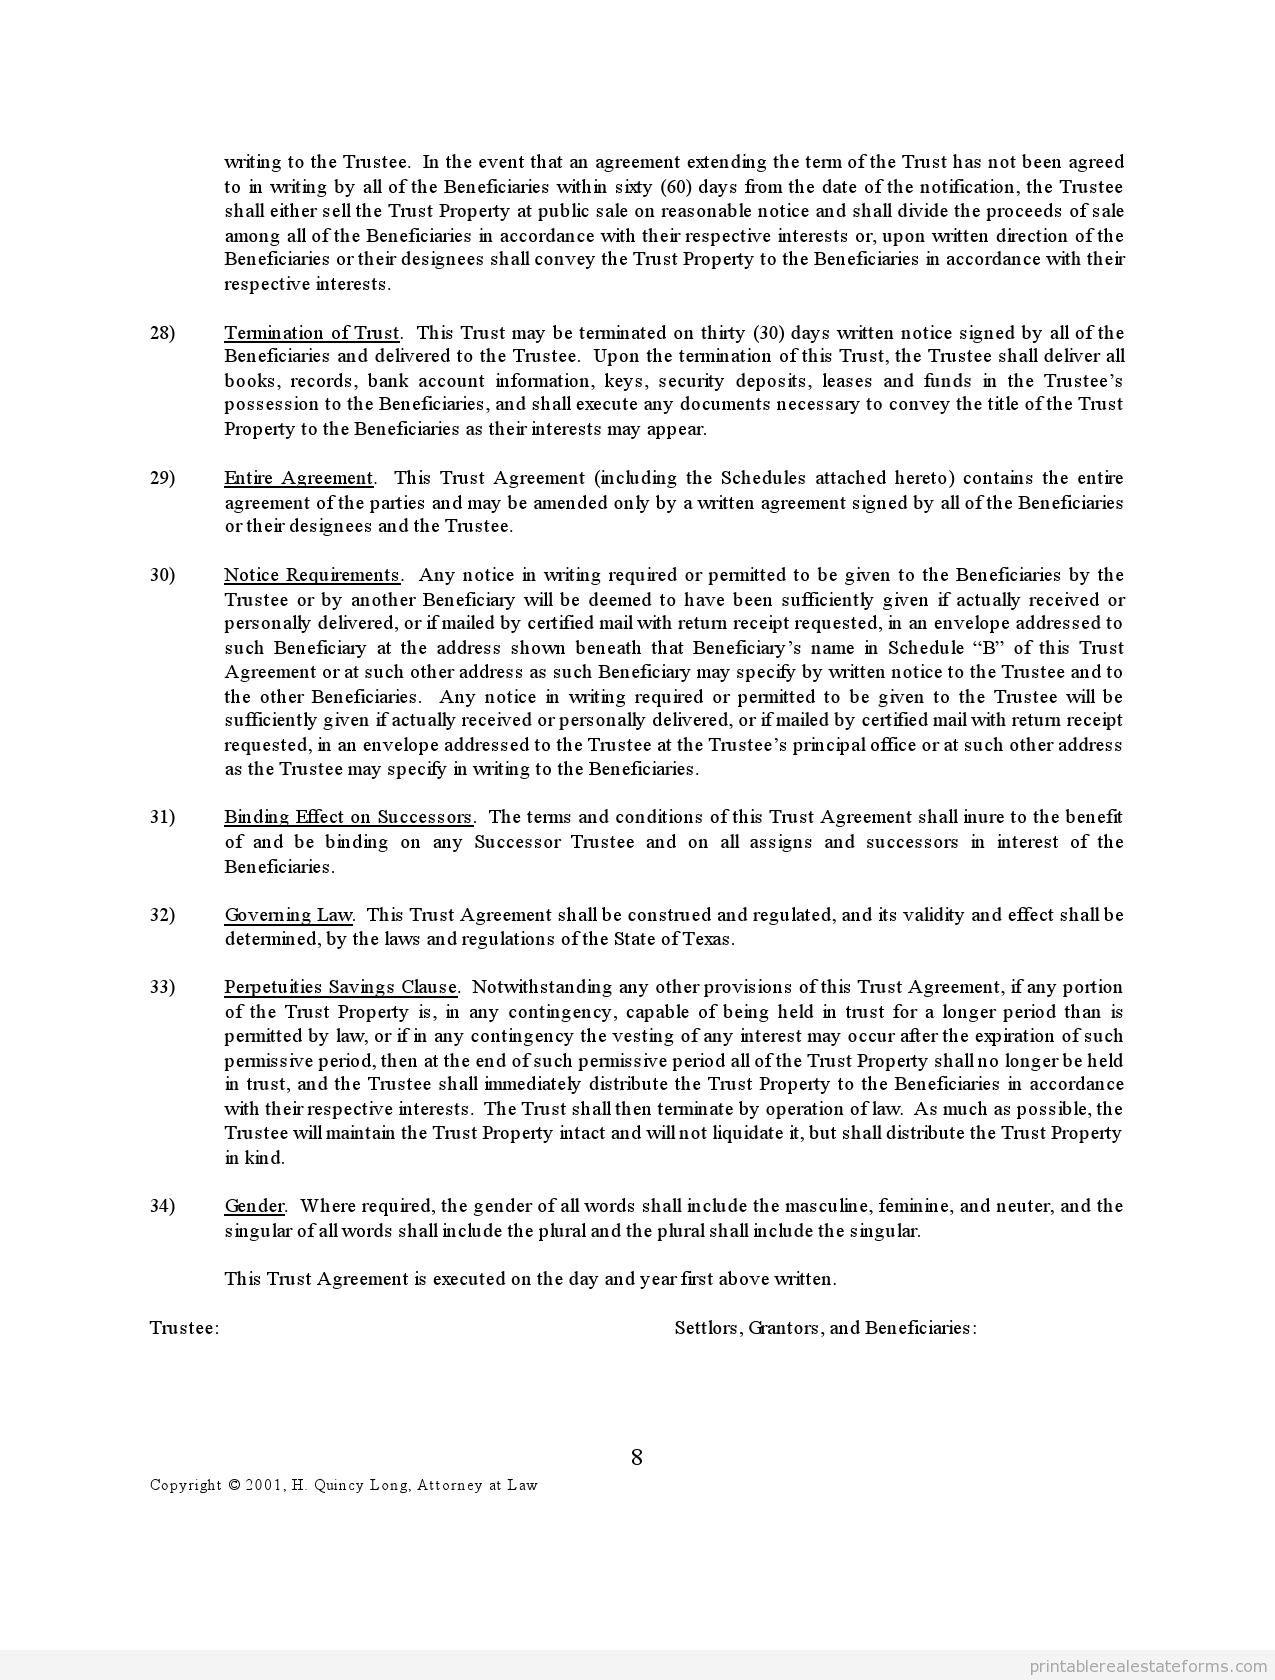 TrustAgreement0008 Printable Real Estate Forms